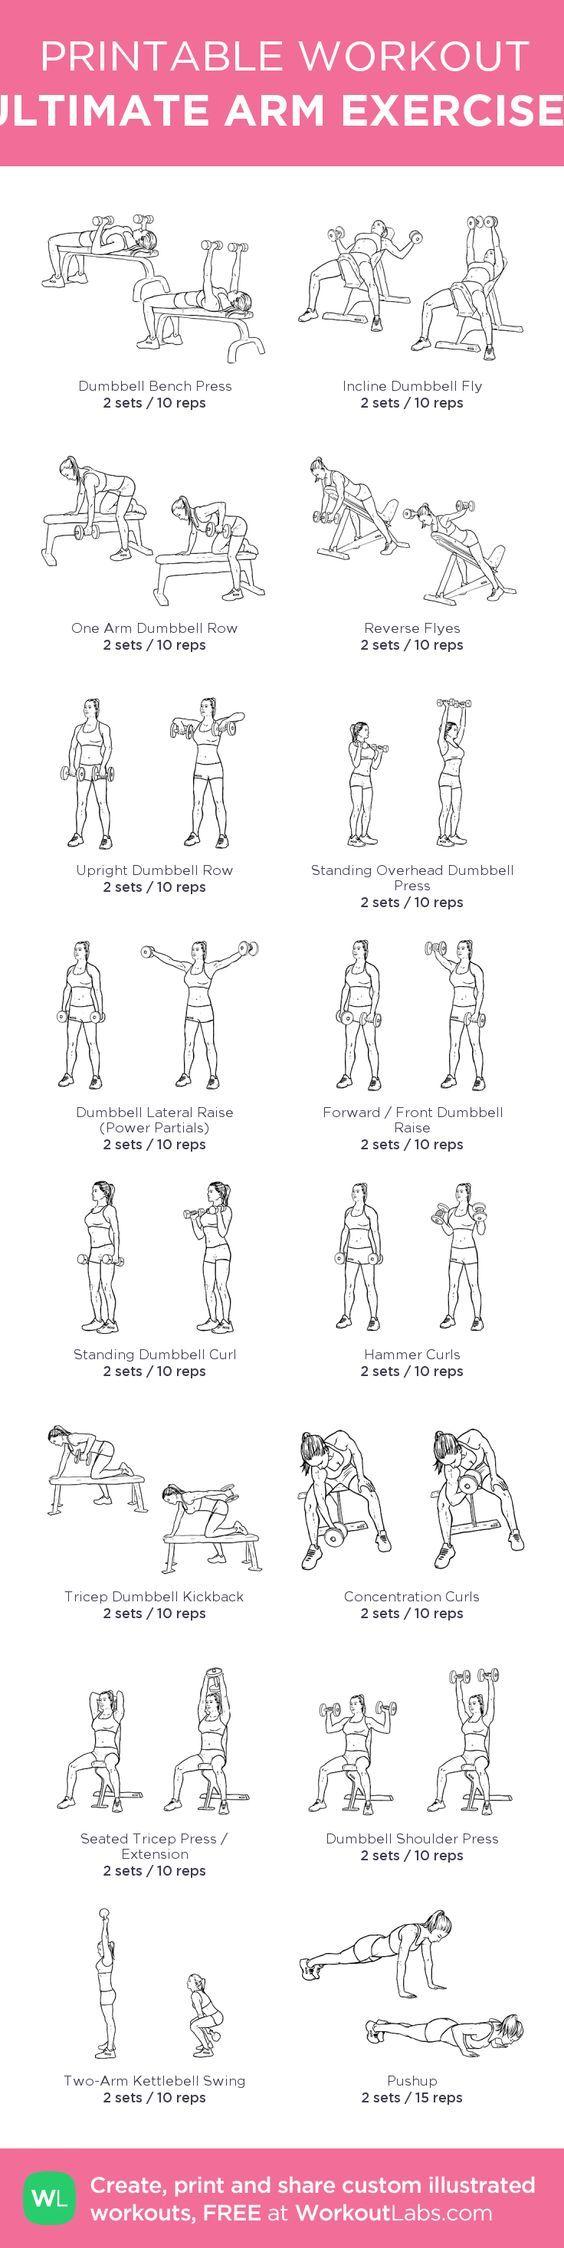 ULTIMATE ARM EXERCISES: my custom printable workout by @WorkoutLabs #workoutlabs #customworkout: